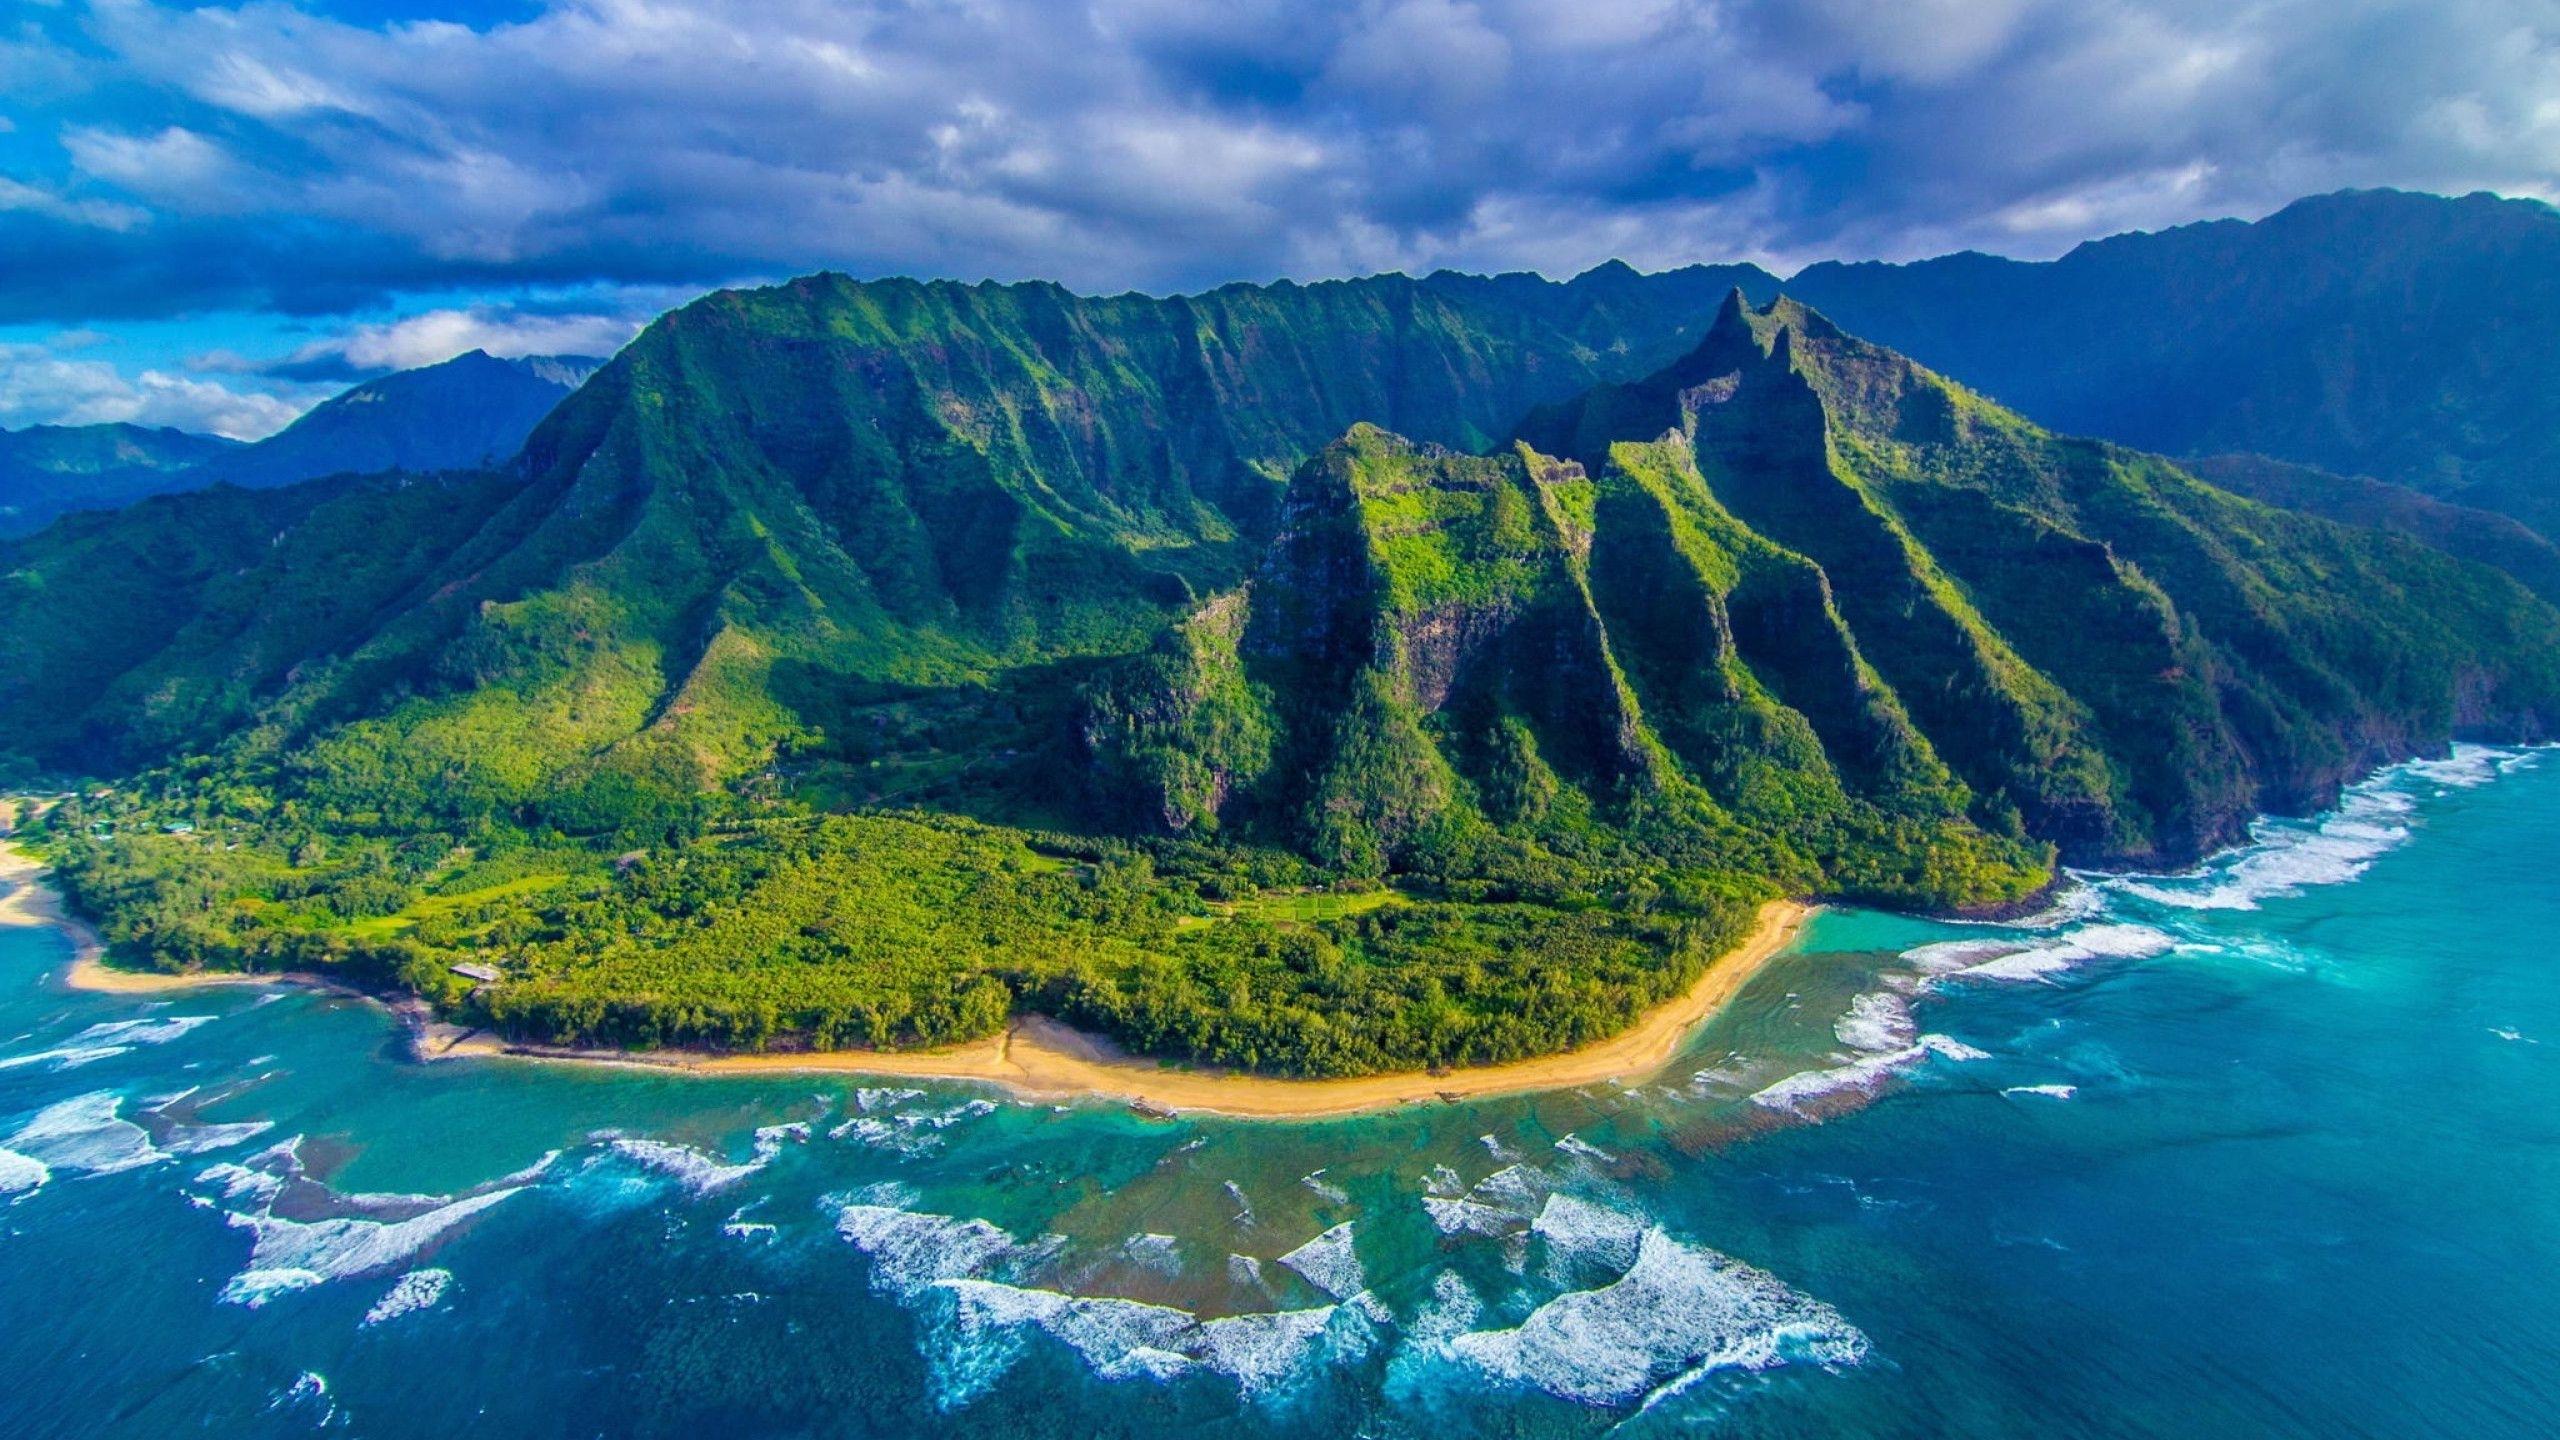 hawaii wallpaper picture for desktop wallpaper 2560 x 1440 px 1.08